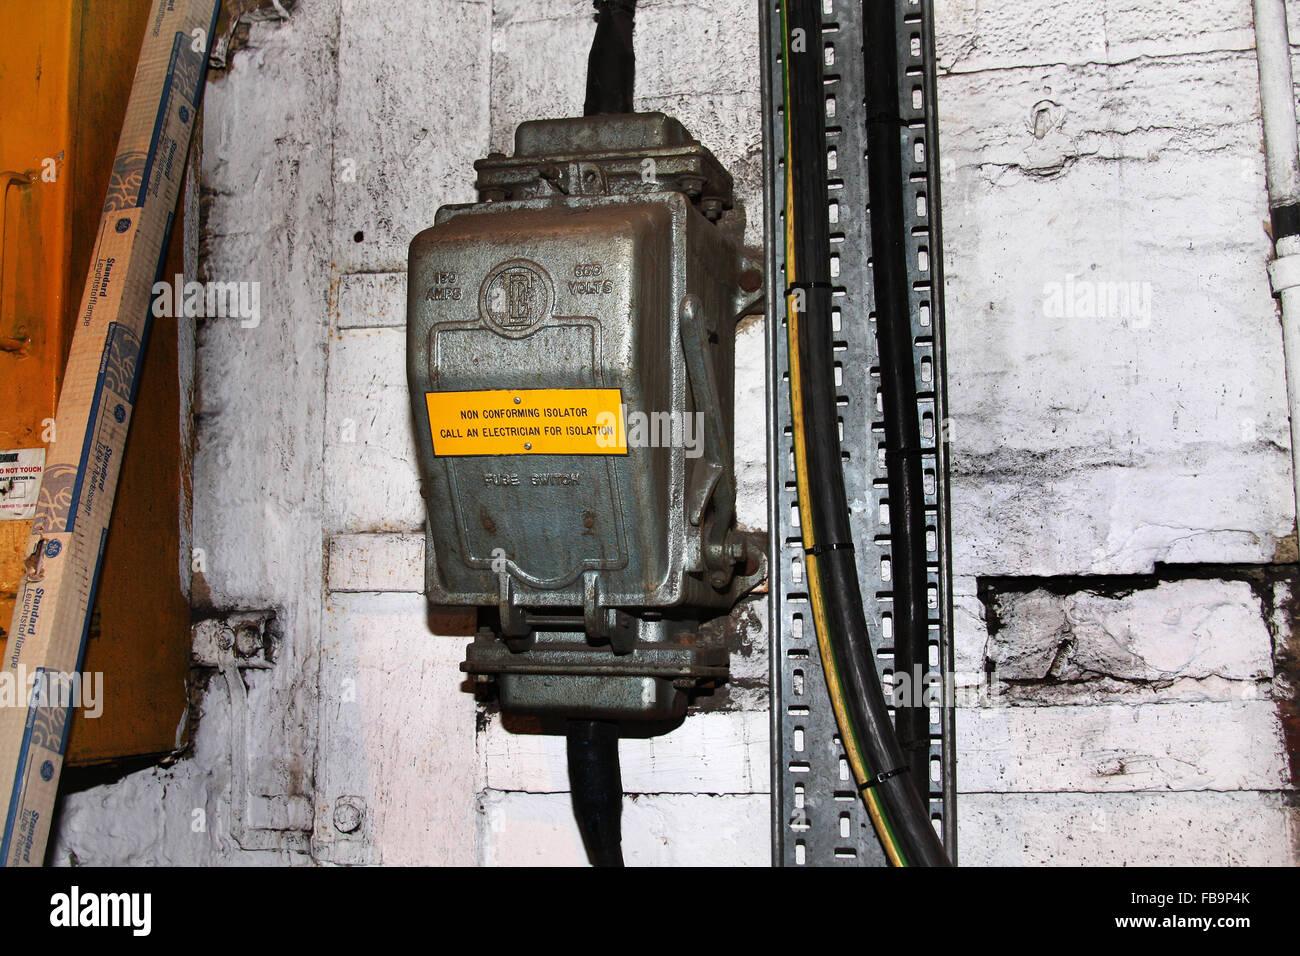 Large electrical isolation box on wall Stock Photo: 93028003 - Alamy